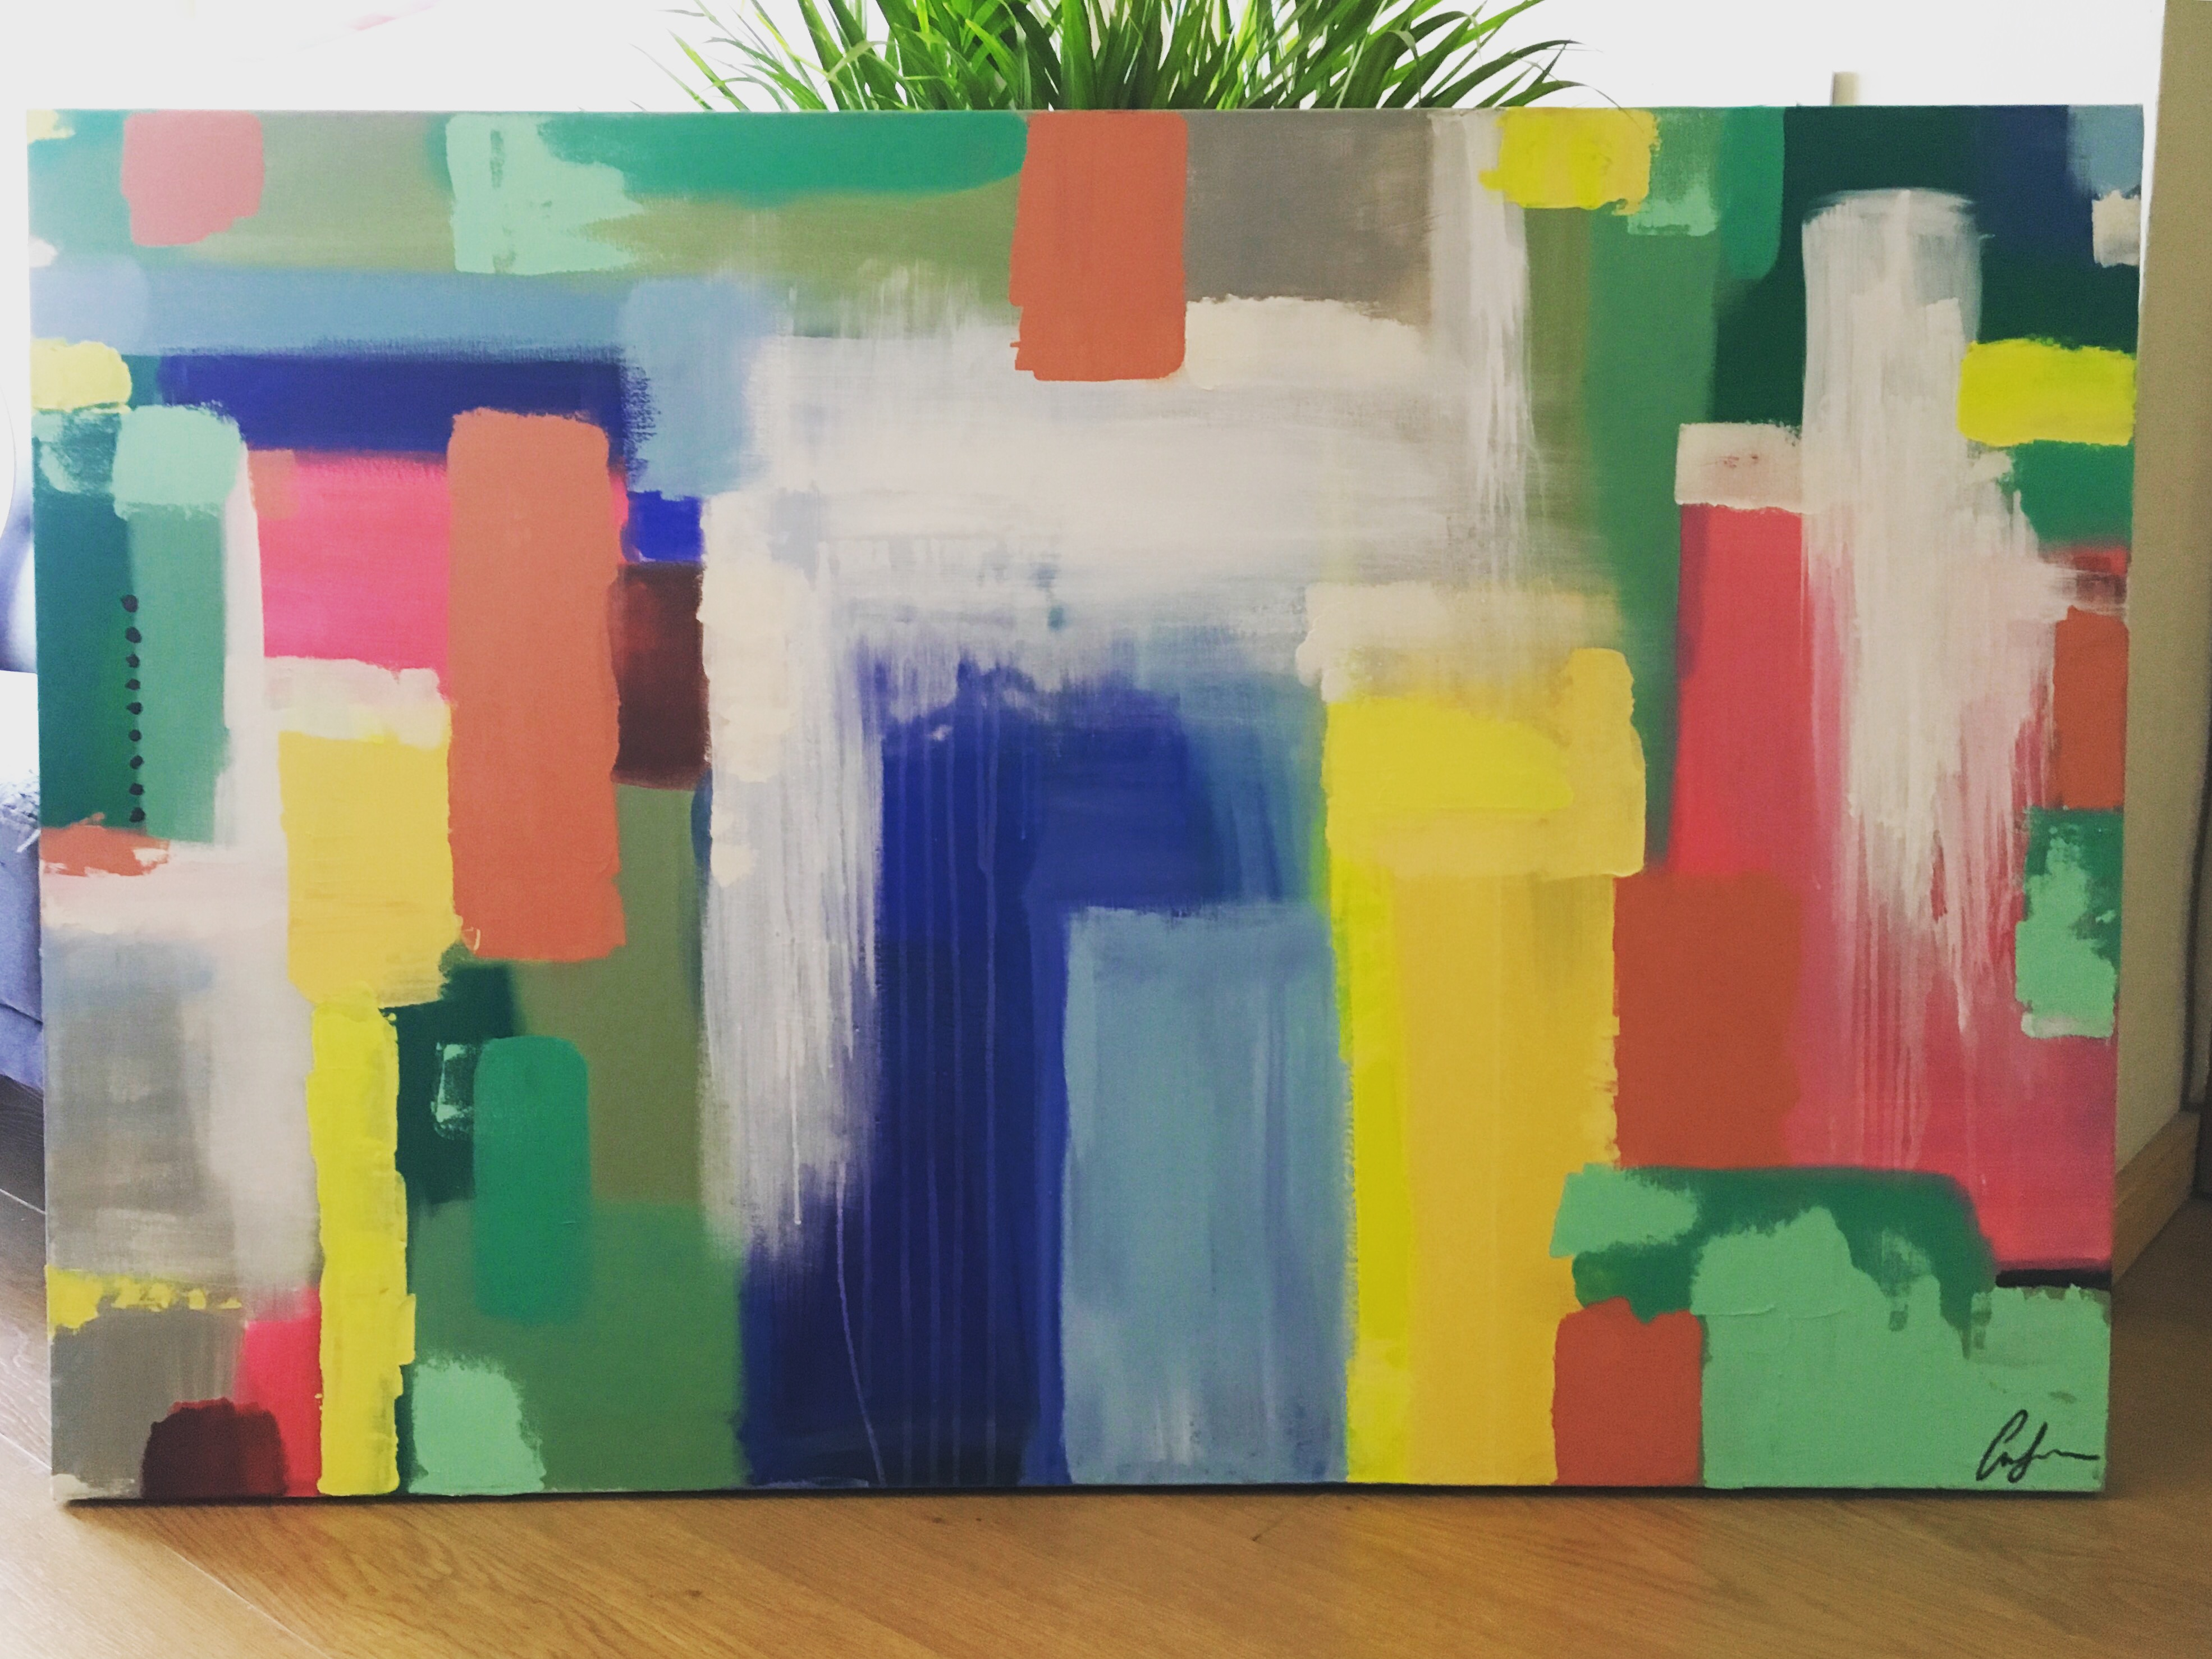 Cristina Gutierrez Gallery